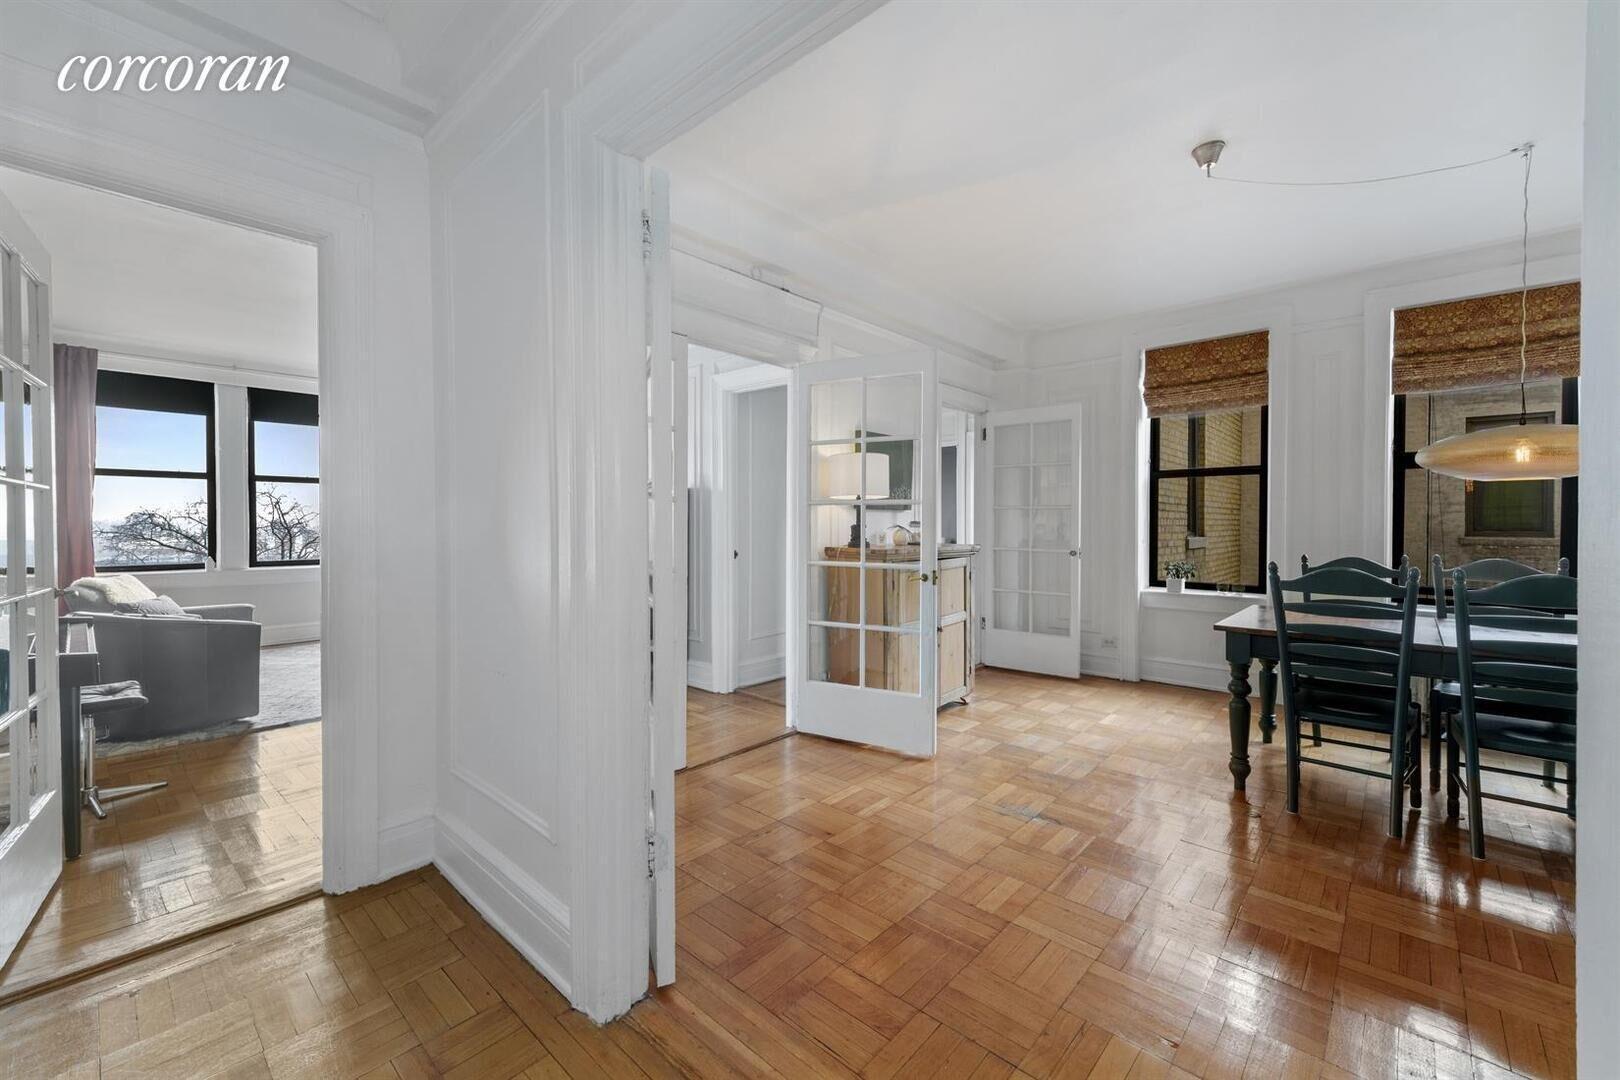 Apartment for sale at 409 Edgecombe Avenue, Apt 5E